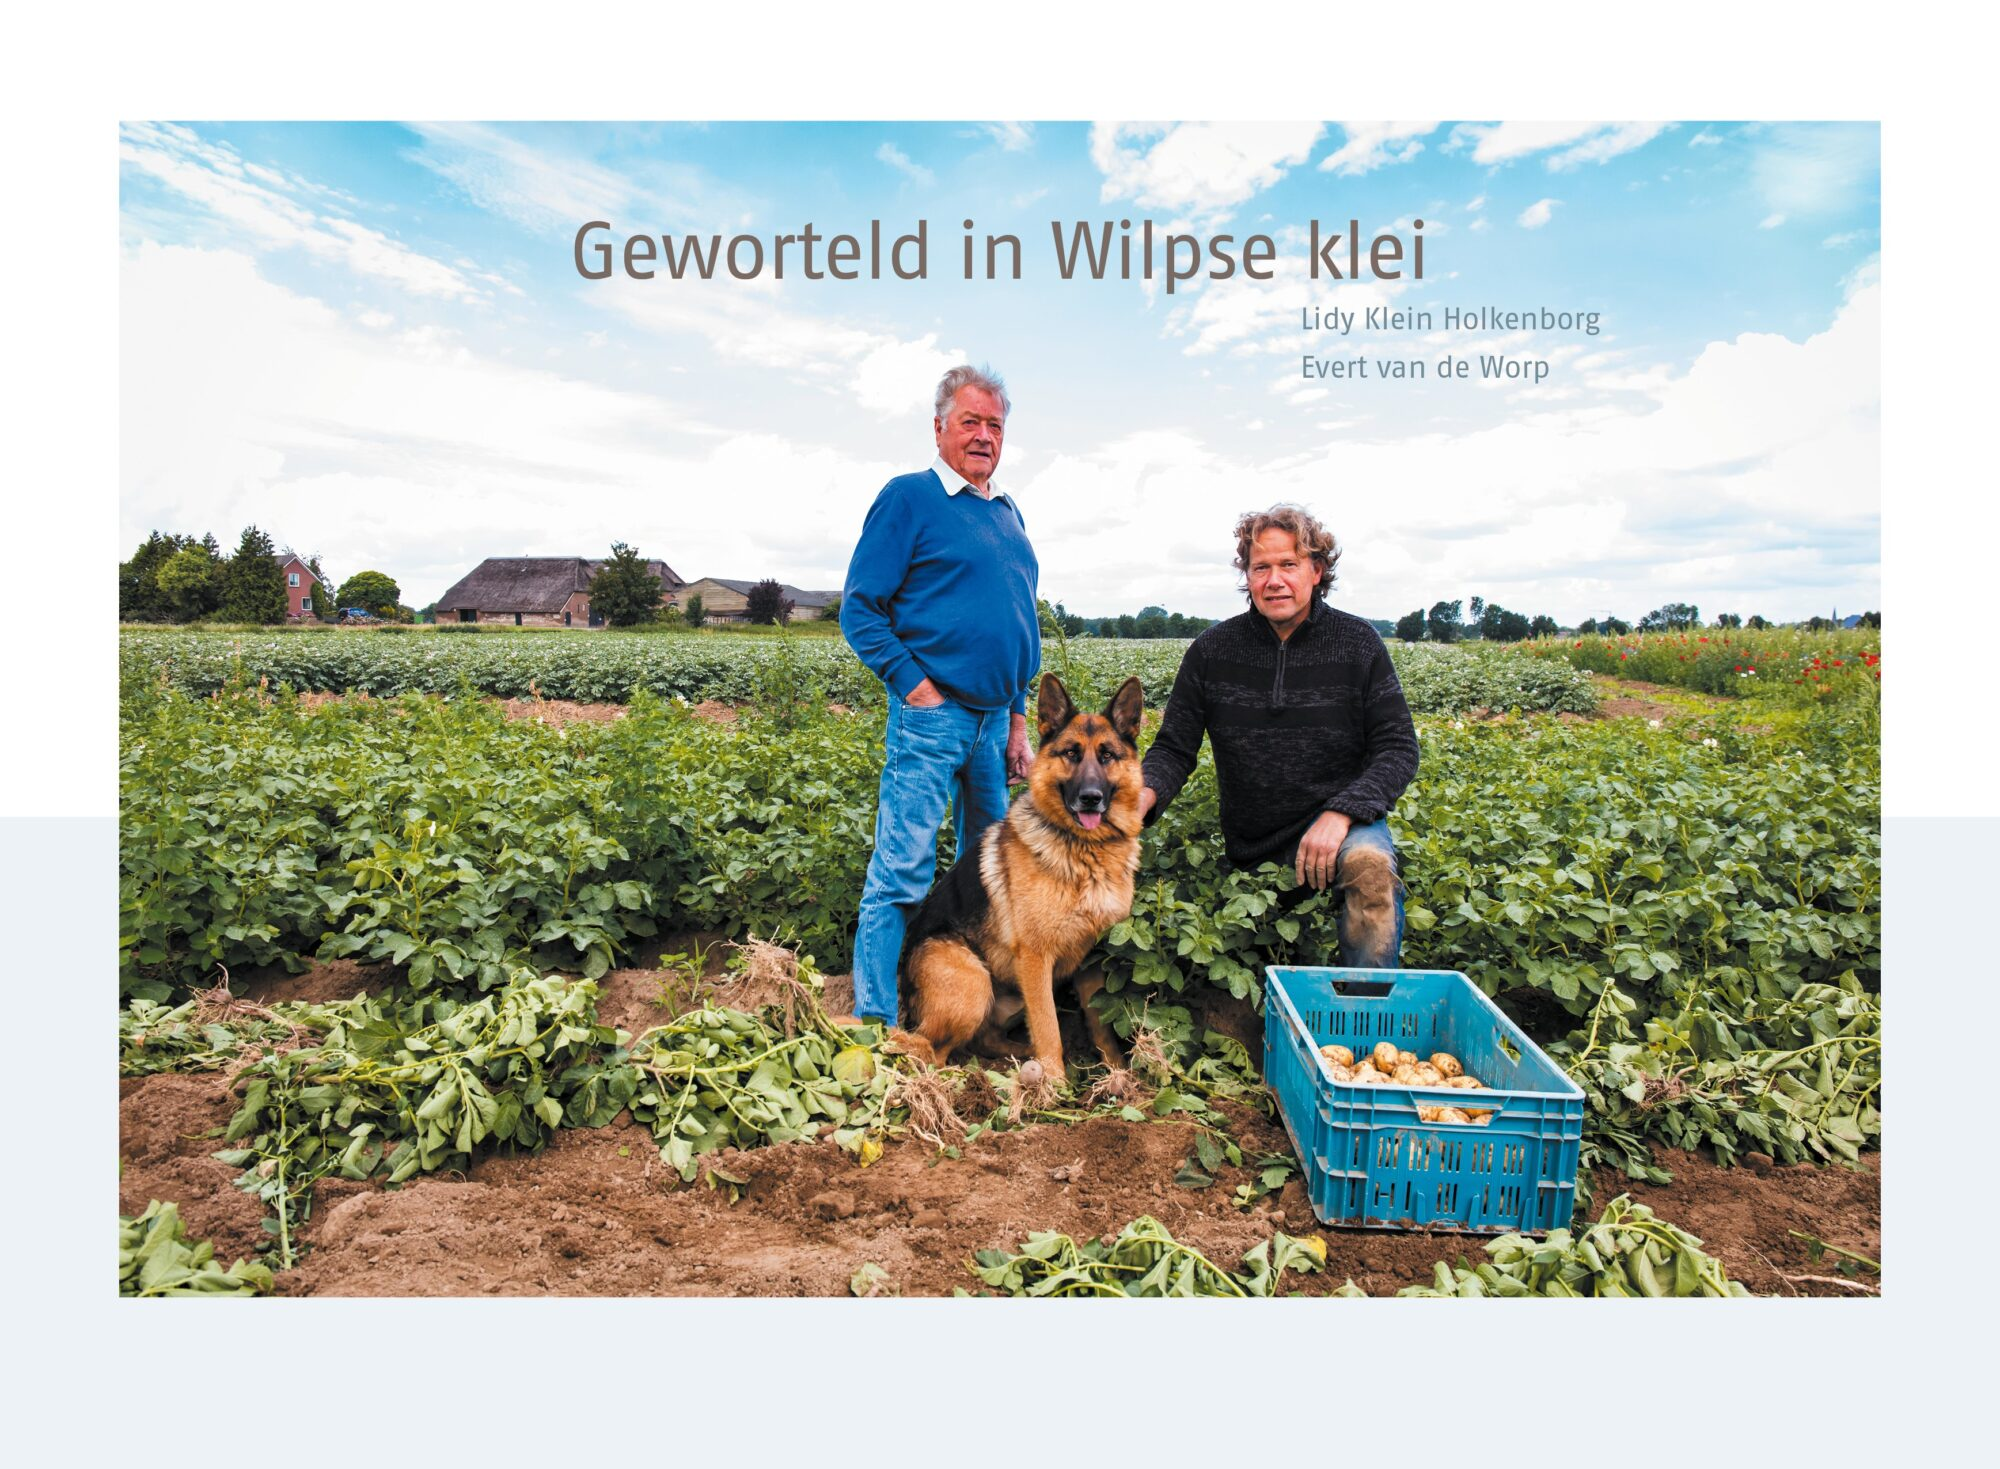 'Toekomst Wilpse Klei wortelt in vruchtbare grond en oude wijsheid'